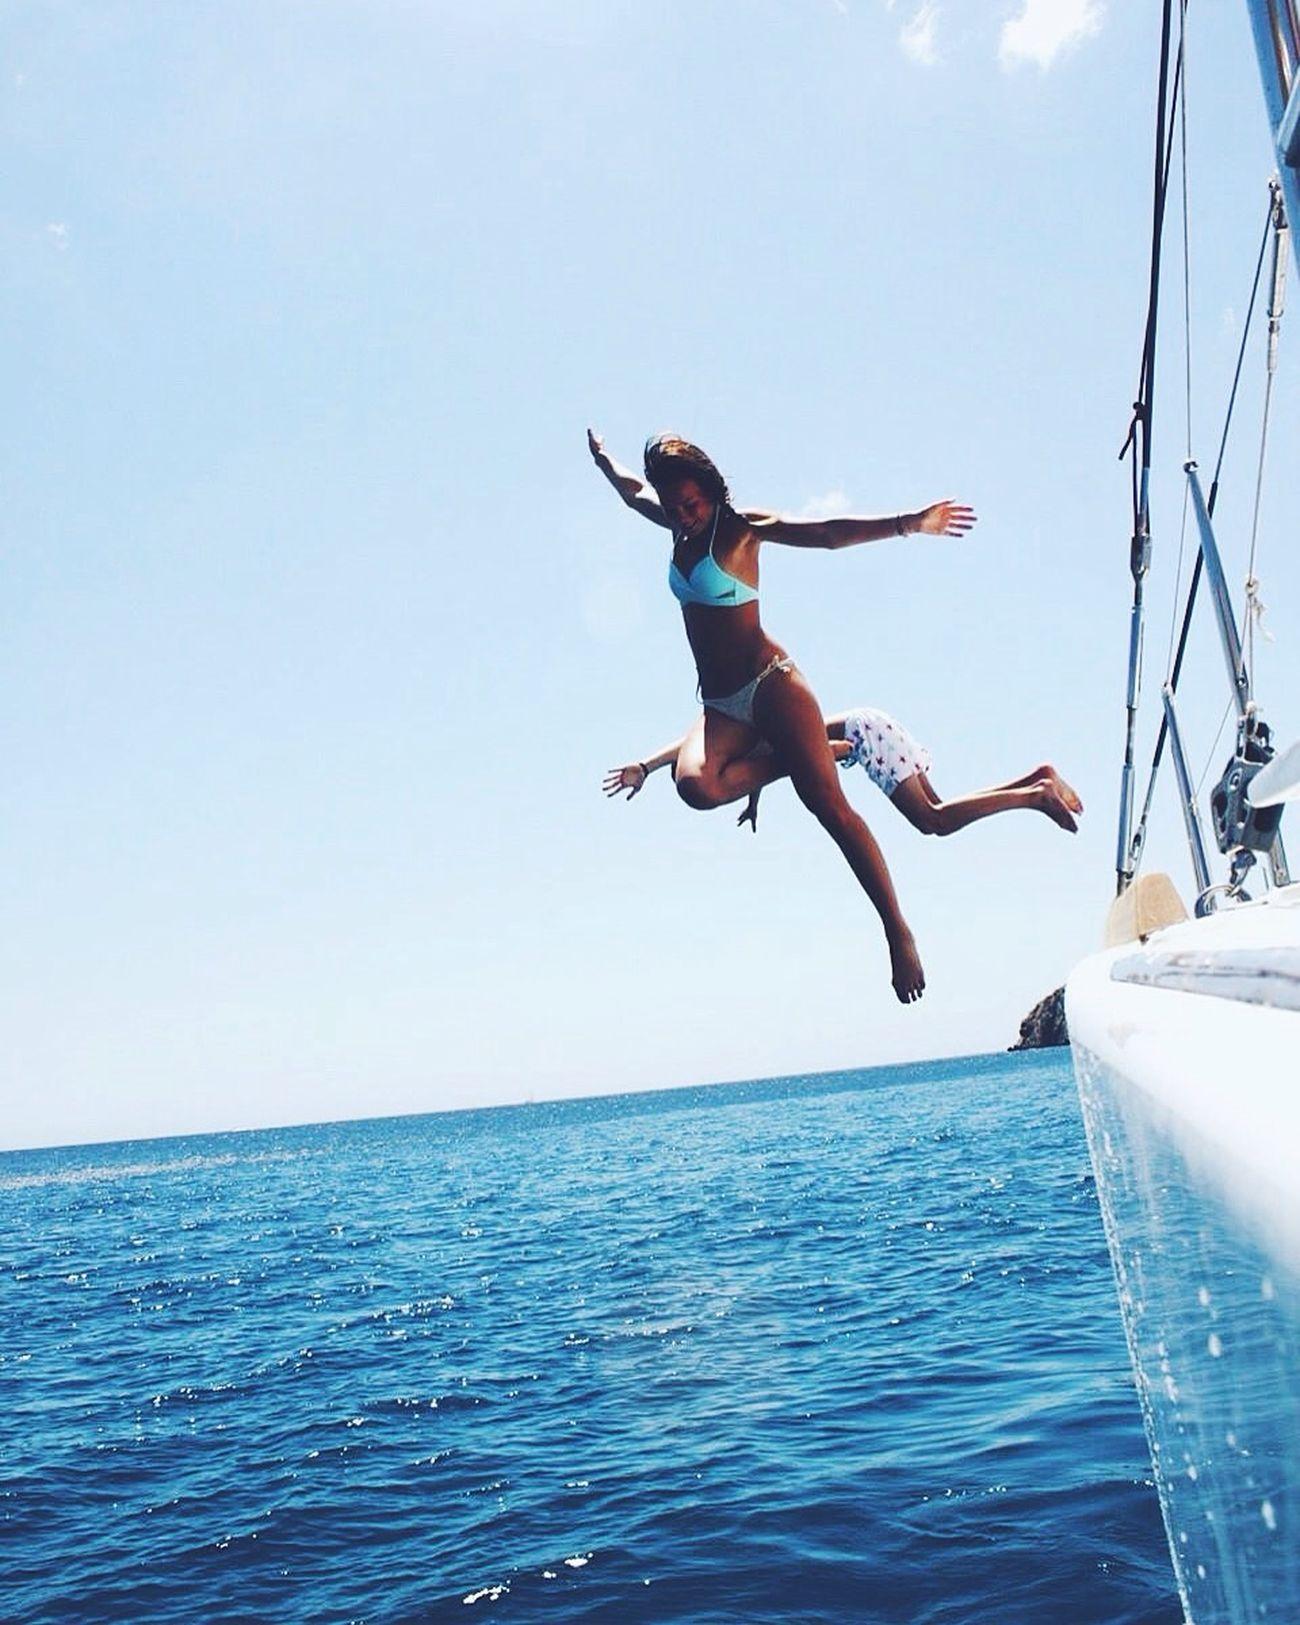 Free as a mermaid Mermaid Beach Ibiza Formentera Bikini Beachbum Skinny First Eyeem Photo